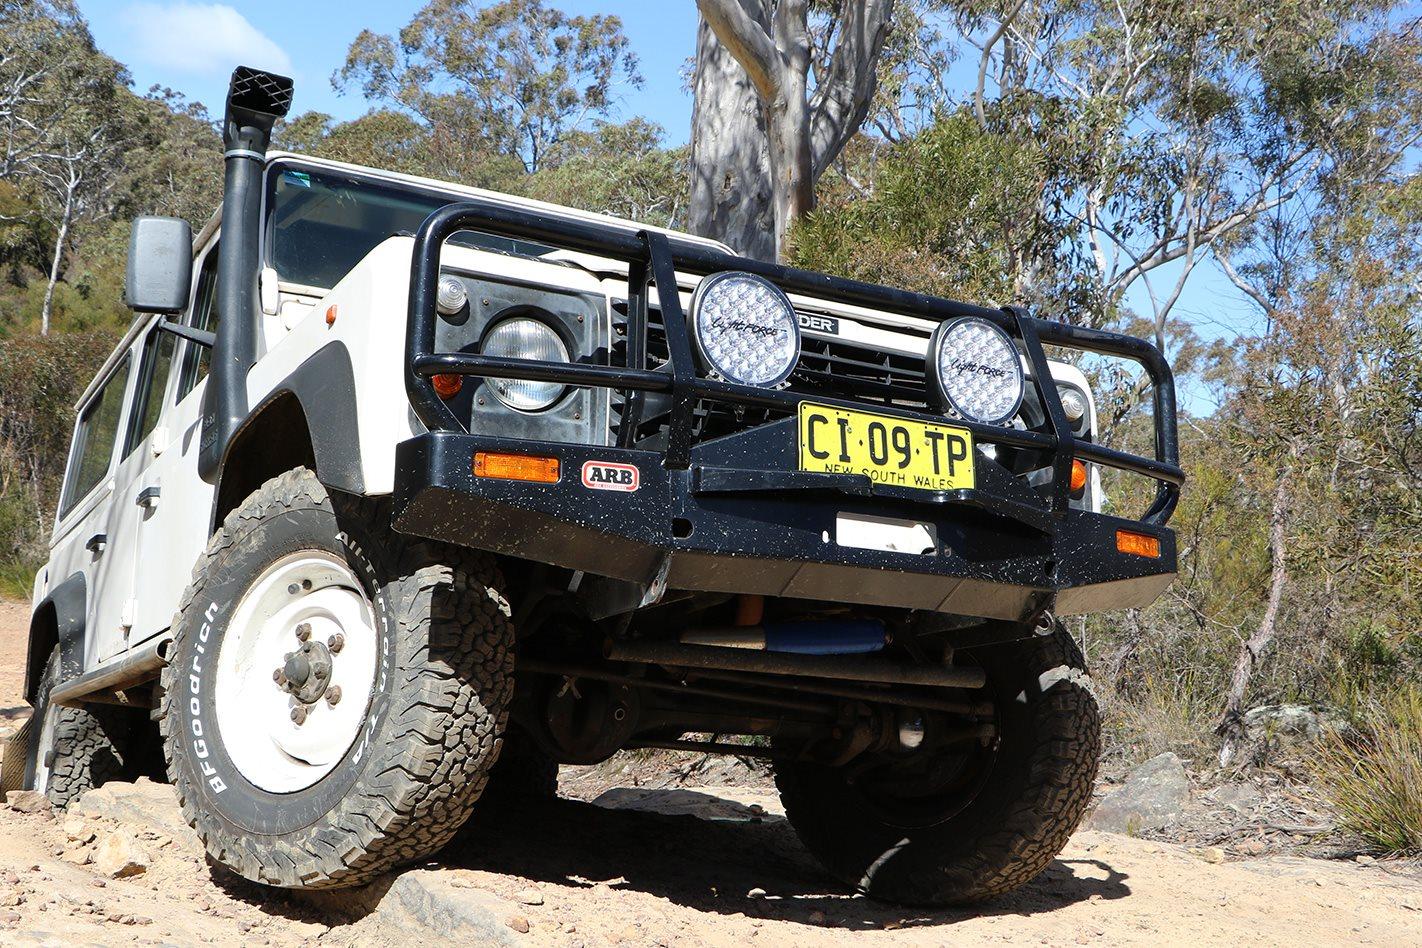 1994-Land-Rover-Defender-300TDI-LED-headlights.jpg